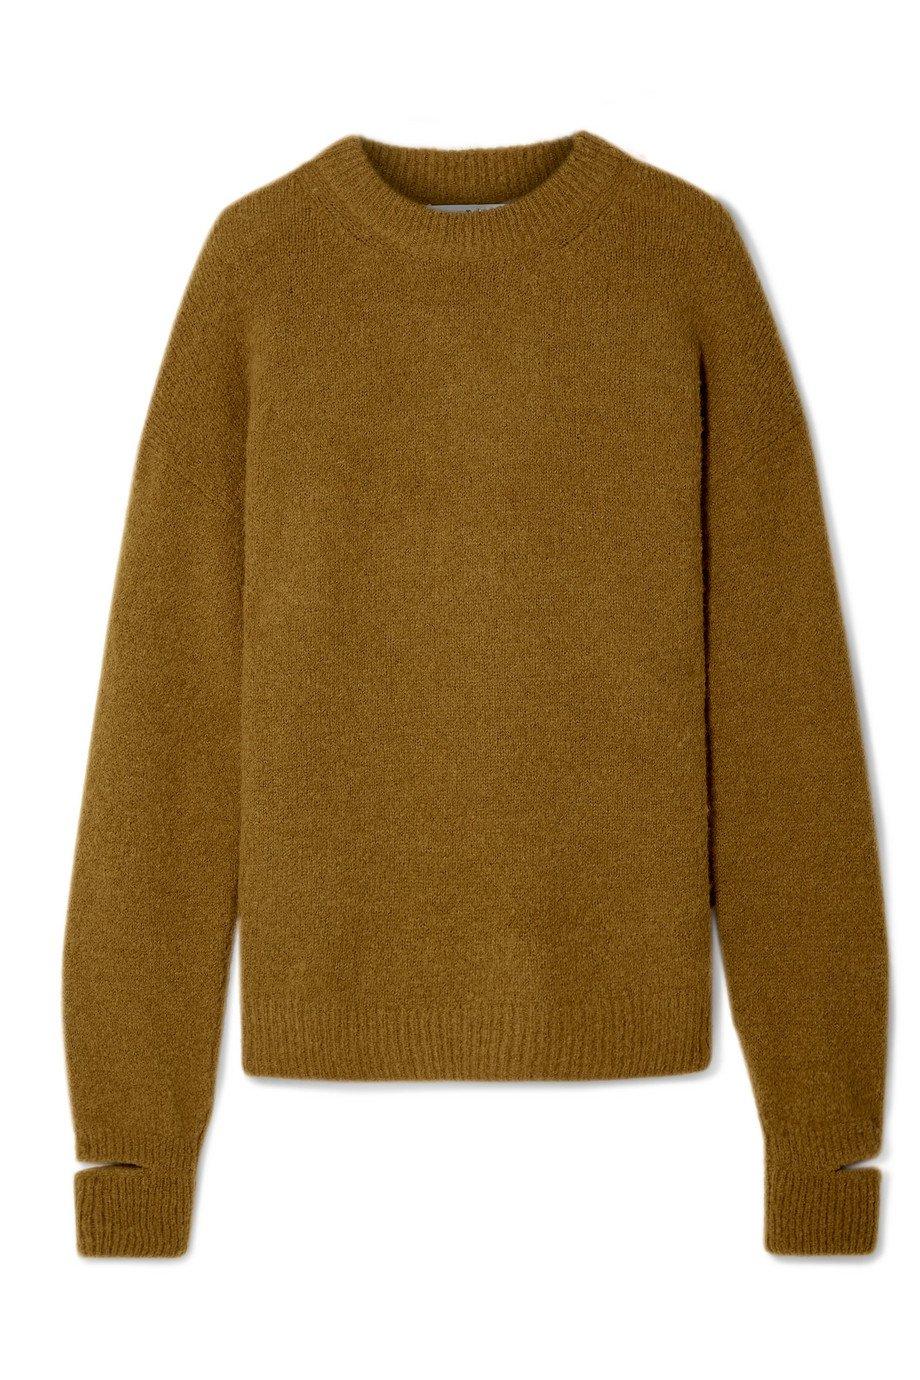 Tibi   Airy oversized alpaca-blend sweater   NET-A-PORTER.COM